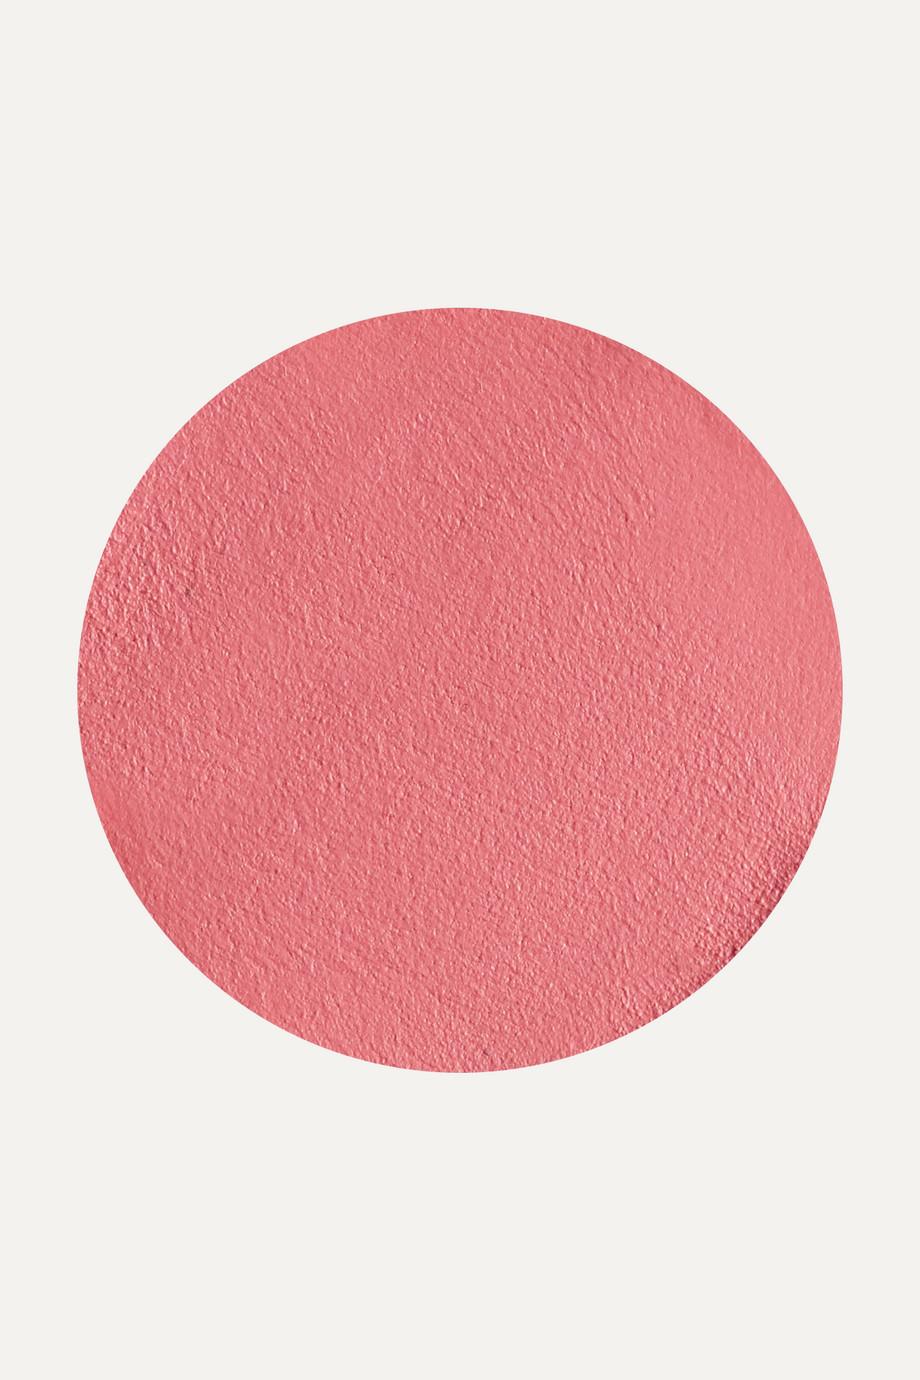 Illamasqua Antimatter Lipstick - Quartz